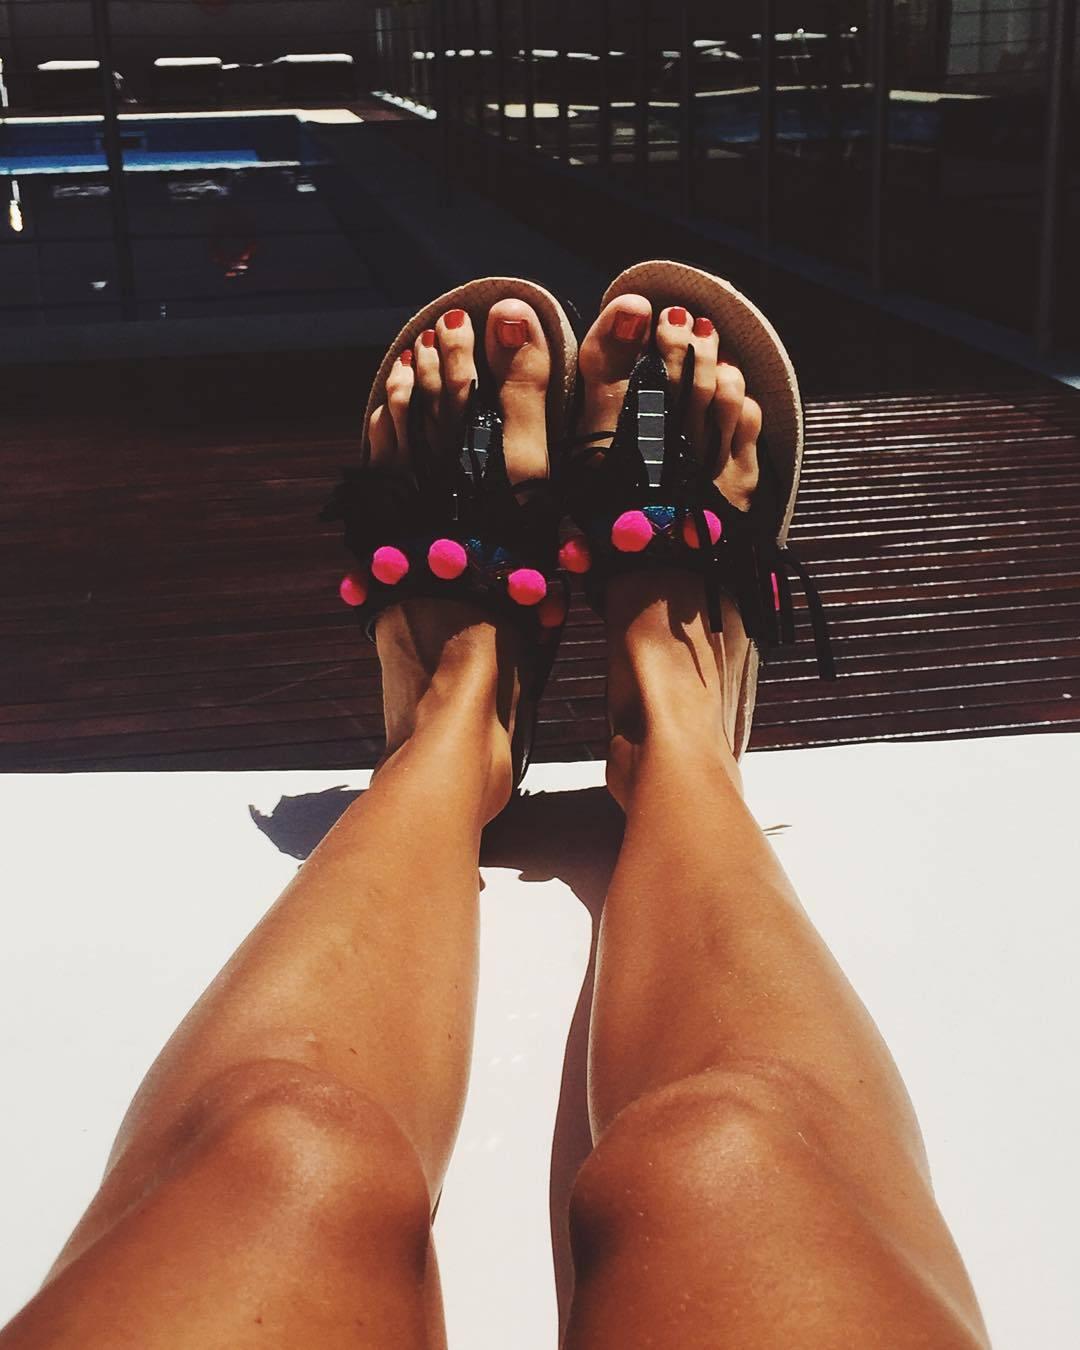 Feet Melina Lezcano nudes (11 photos), Leaked